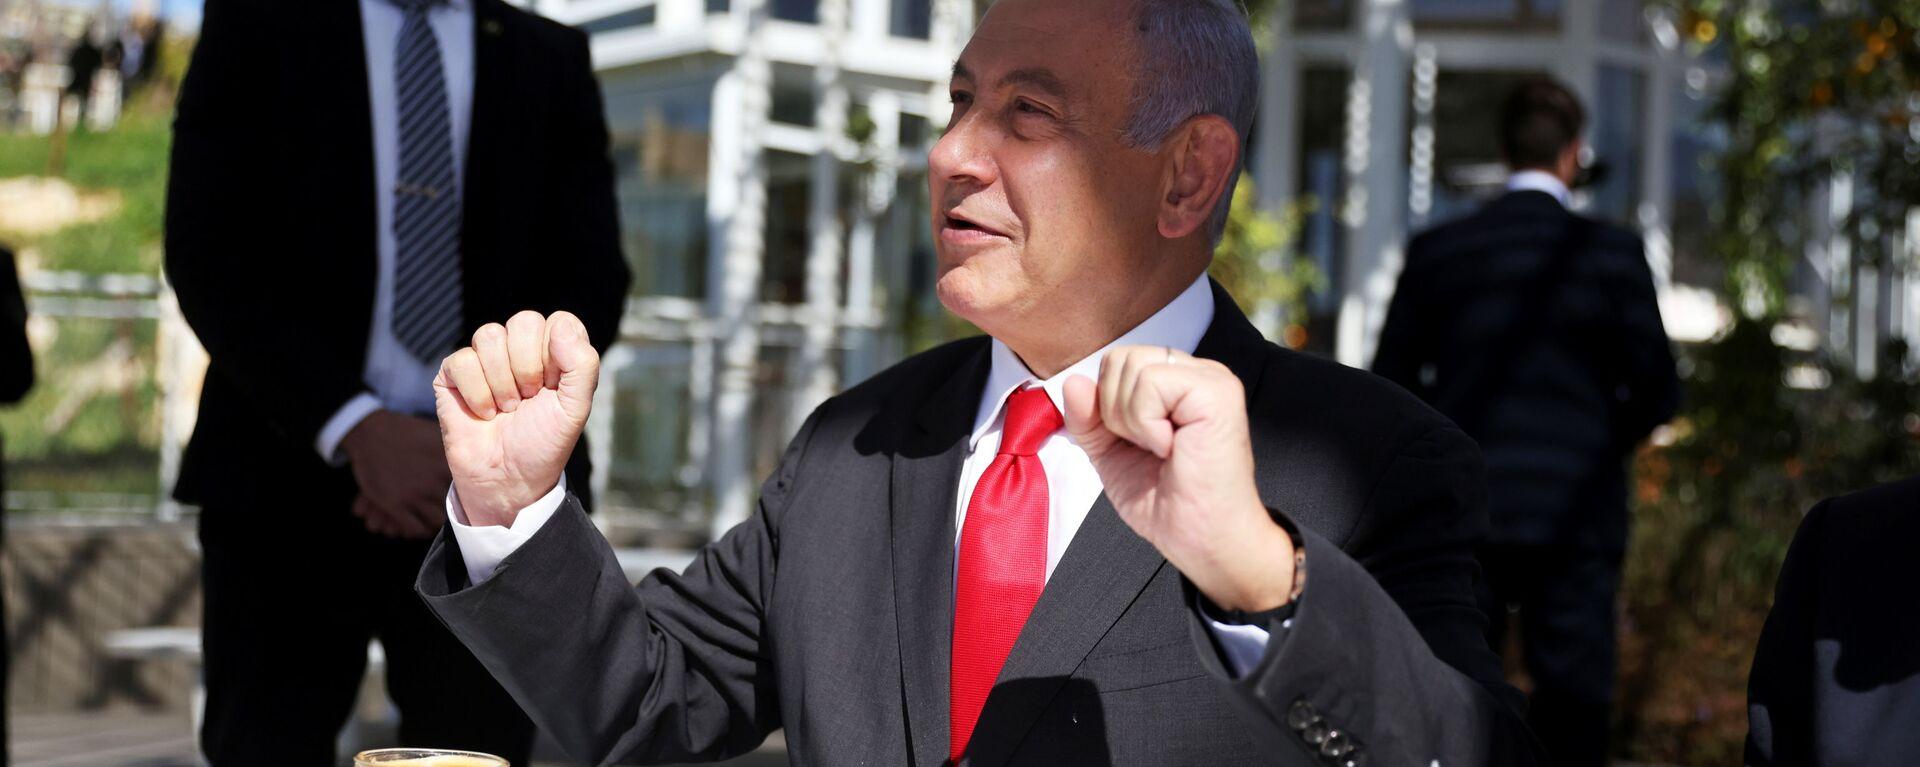 Israel Prime Minister, Benjamin Netanyahu gestures as he sits in a cafe while Israel further eases coronavirus disease (COVID-19) restrictions in Jerusalem March 7, 2021 - Sputnik International, 1920, 01.09.2021